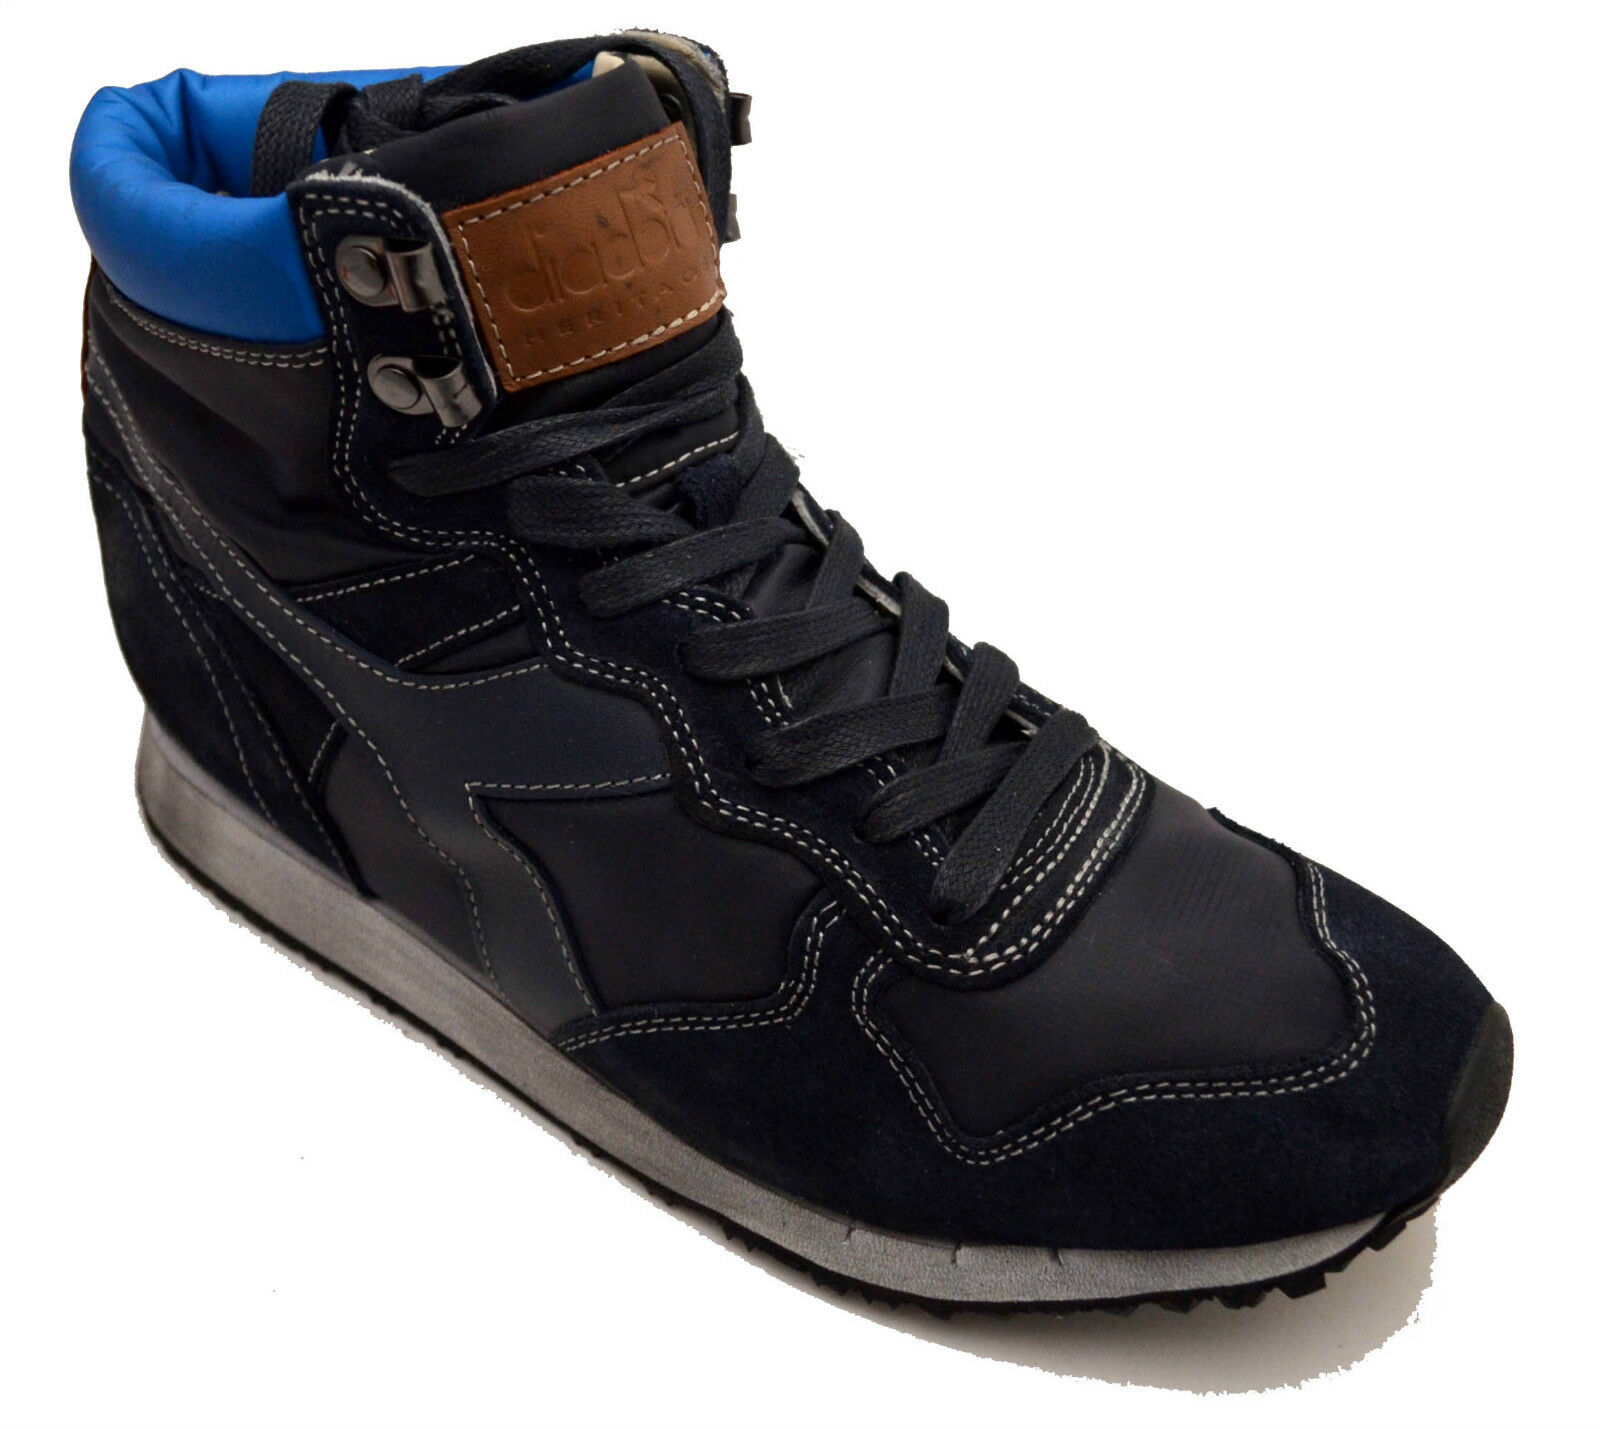 Diadora Heritage Schuhe Turnschuhe Haut Vintage Mann Frau Frauen 159225